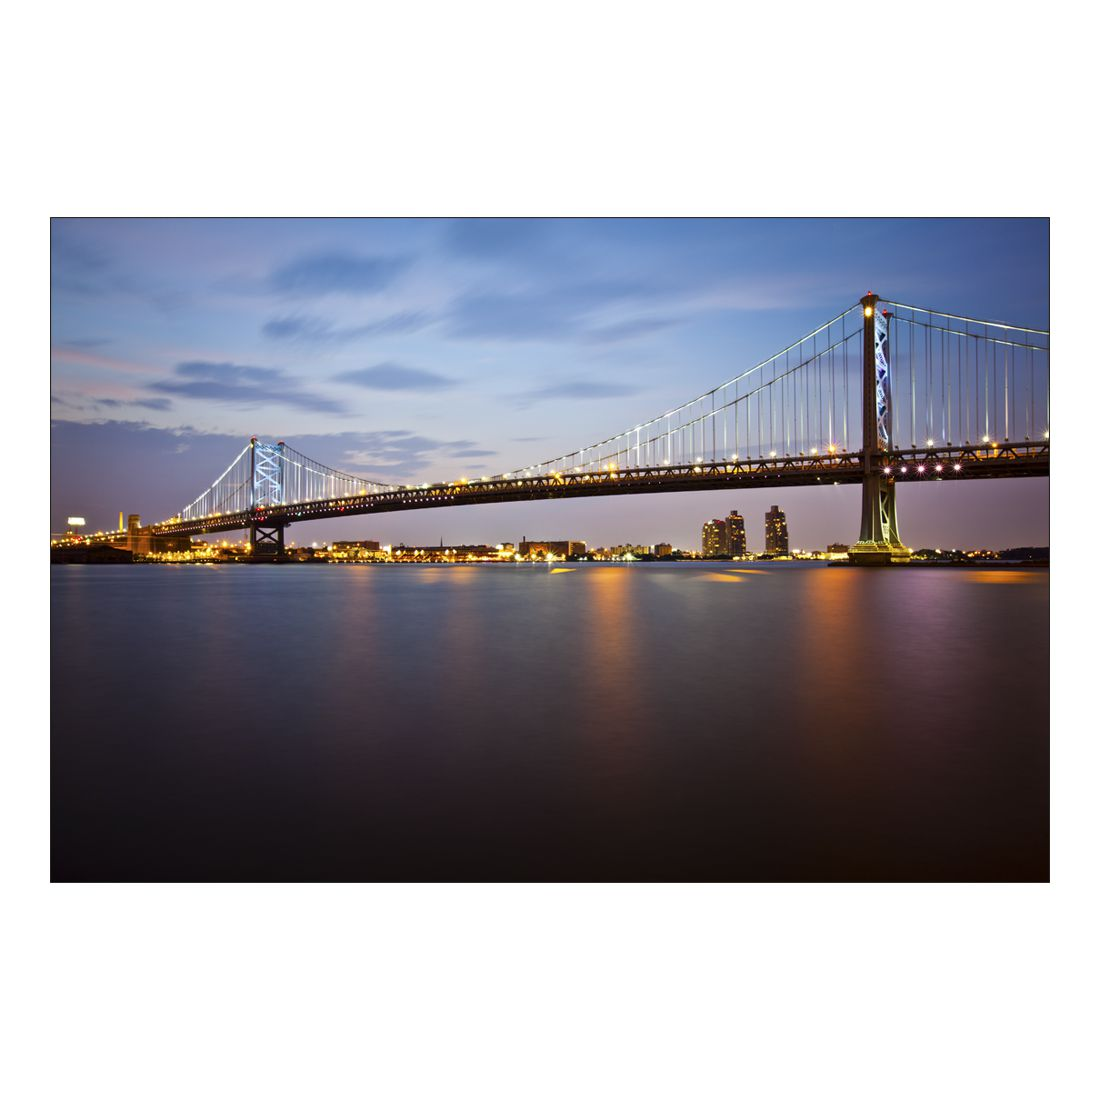 Acrylglasbild Bridge Lights – Abmessung 30×20 cm, Gallery of Innovative Art online kaufen